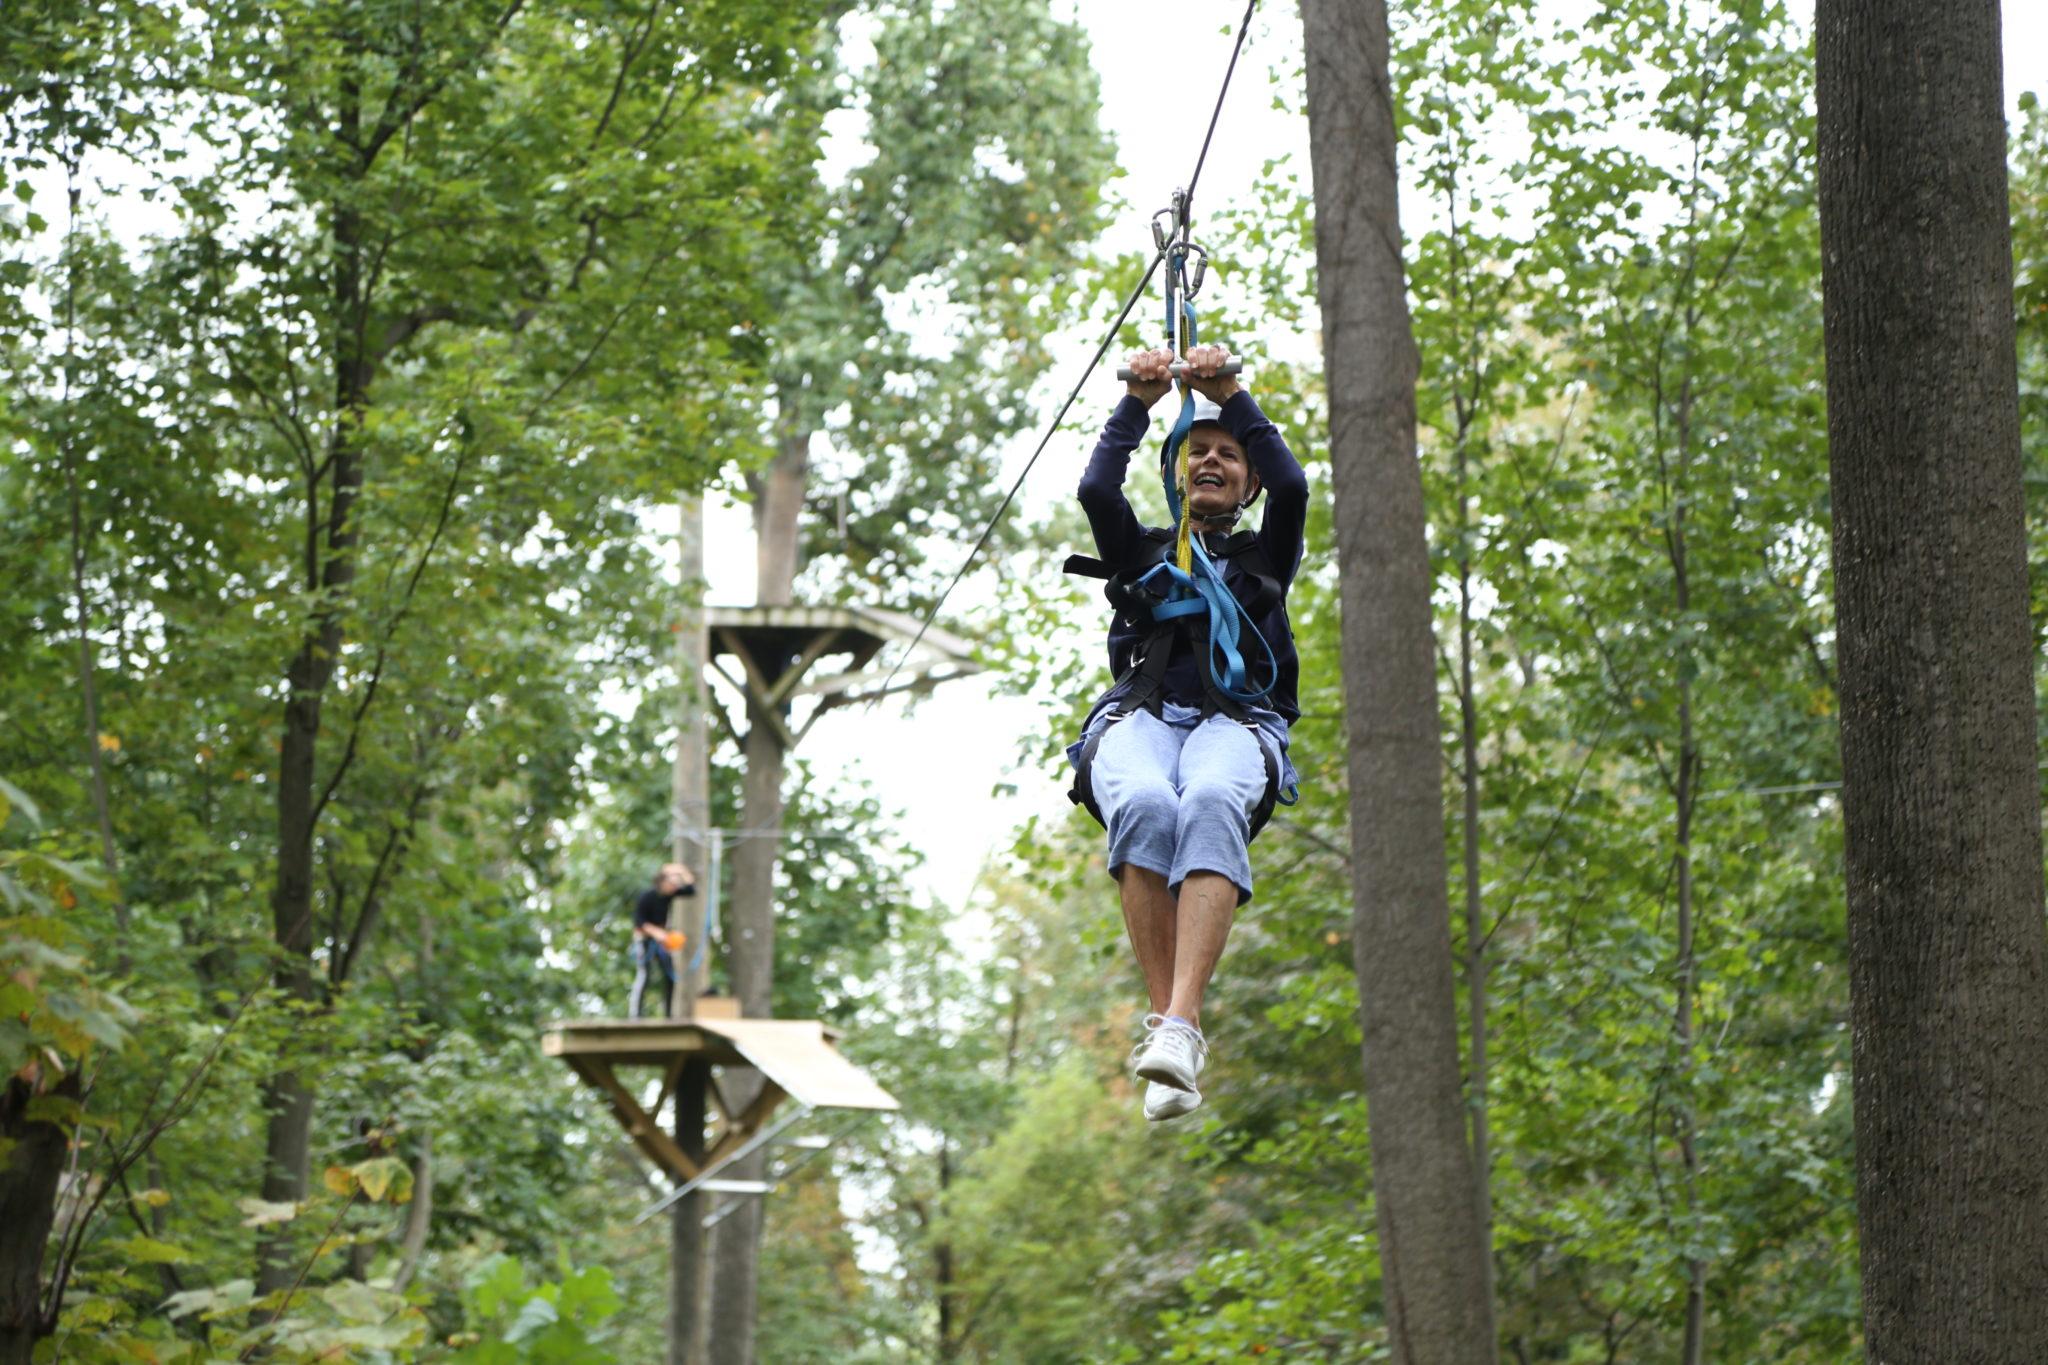 Flying V Zipline Adult Summer